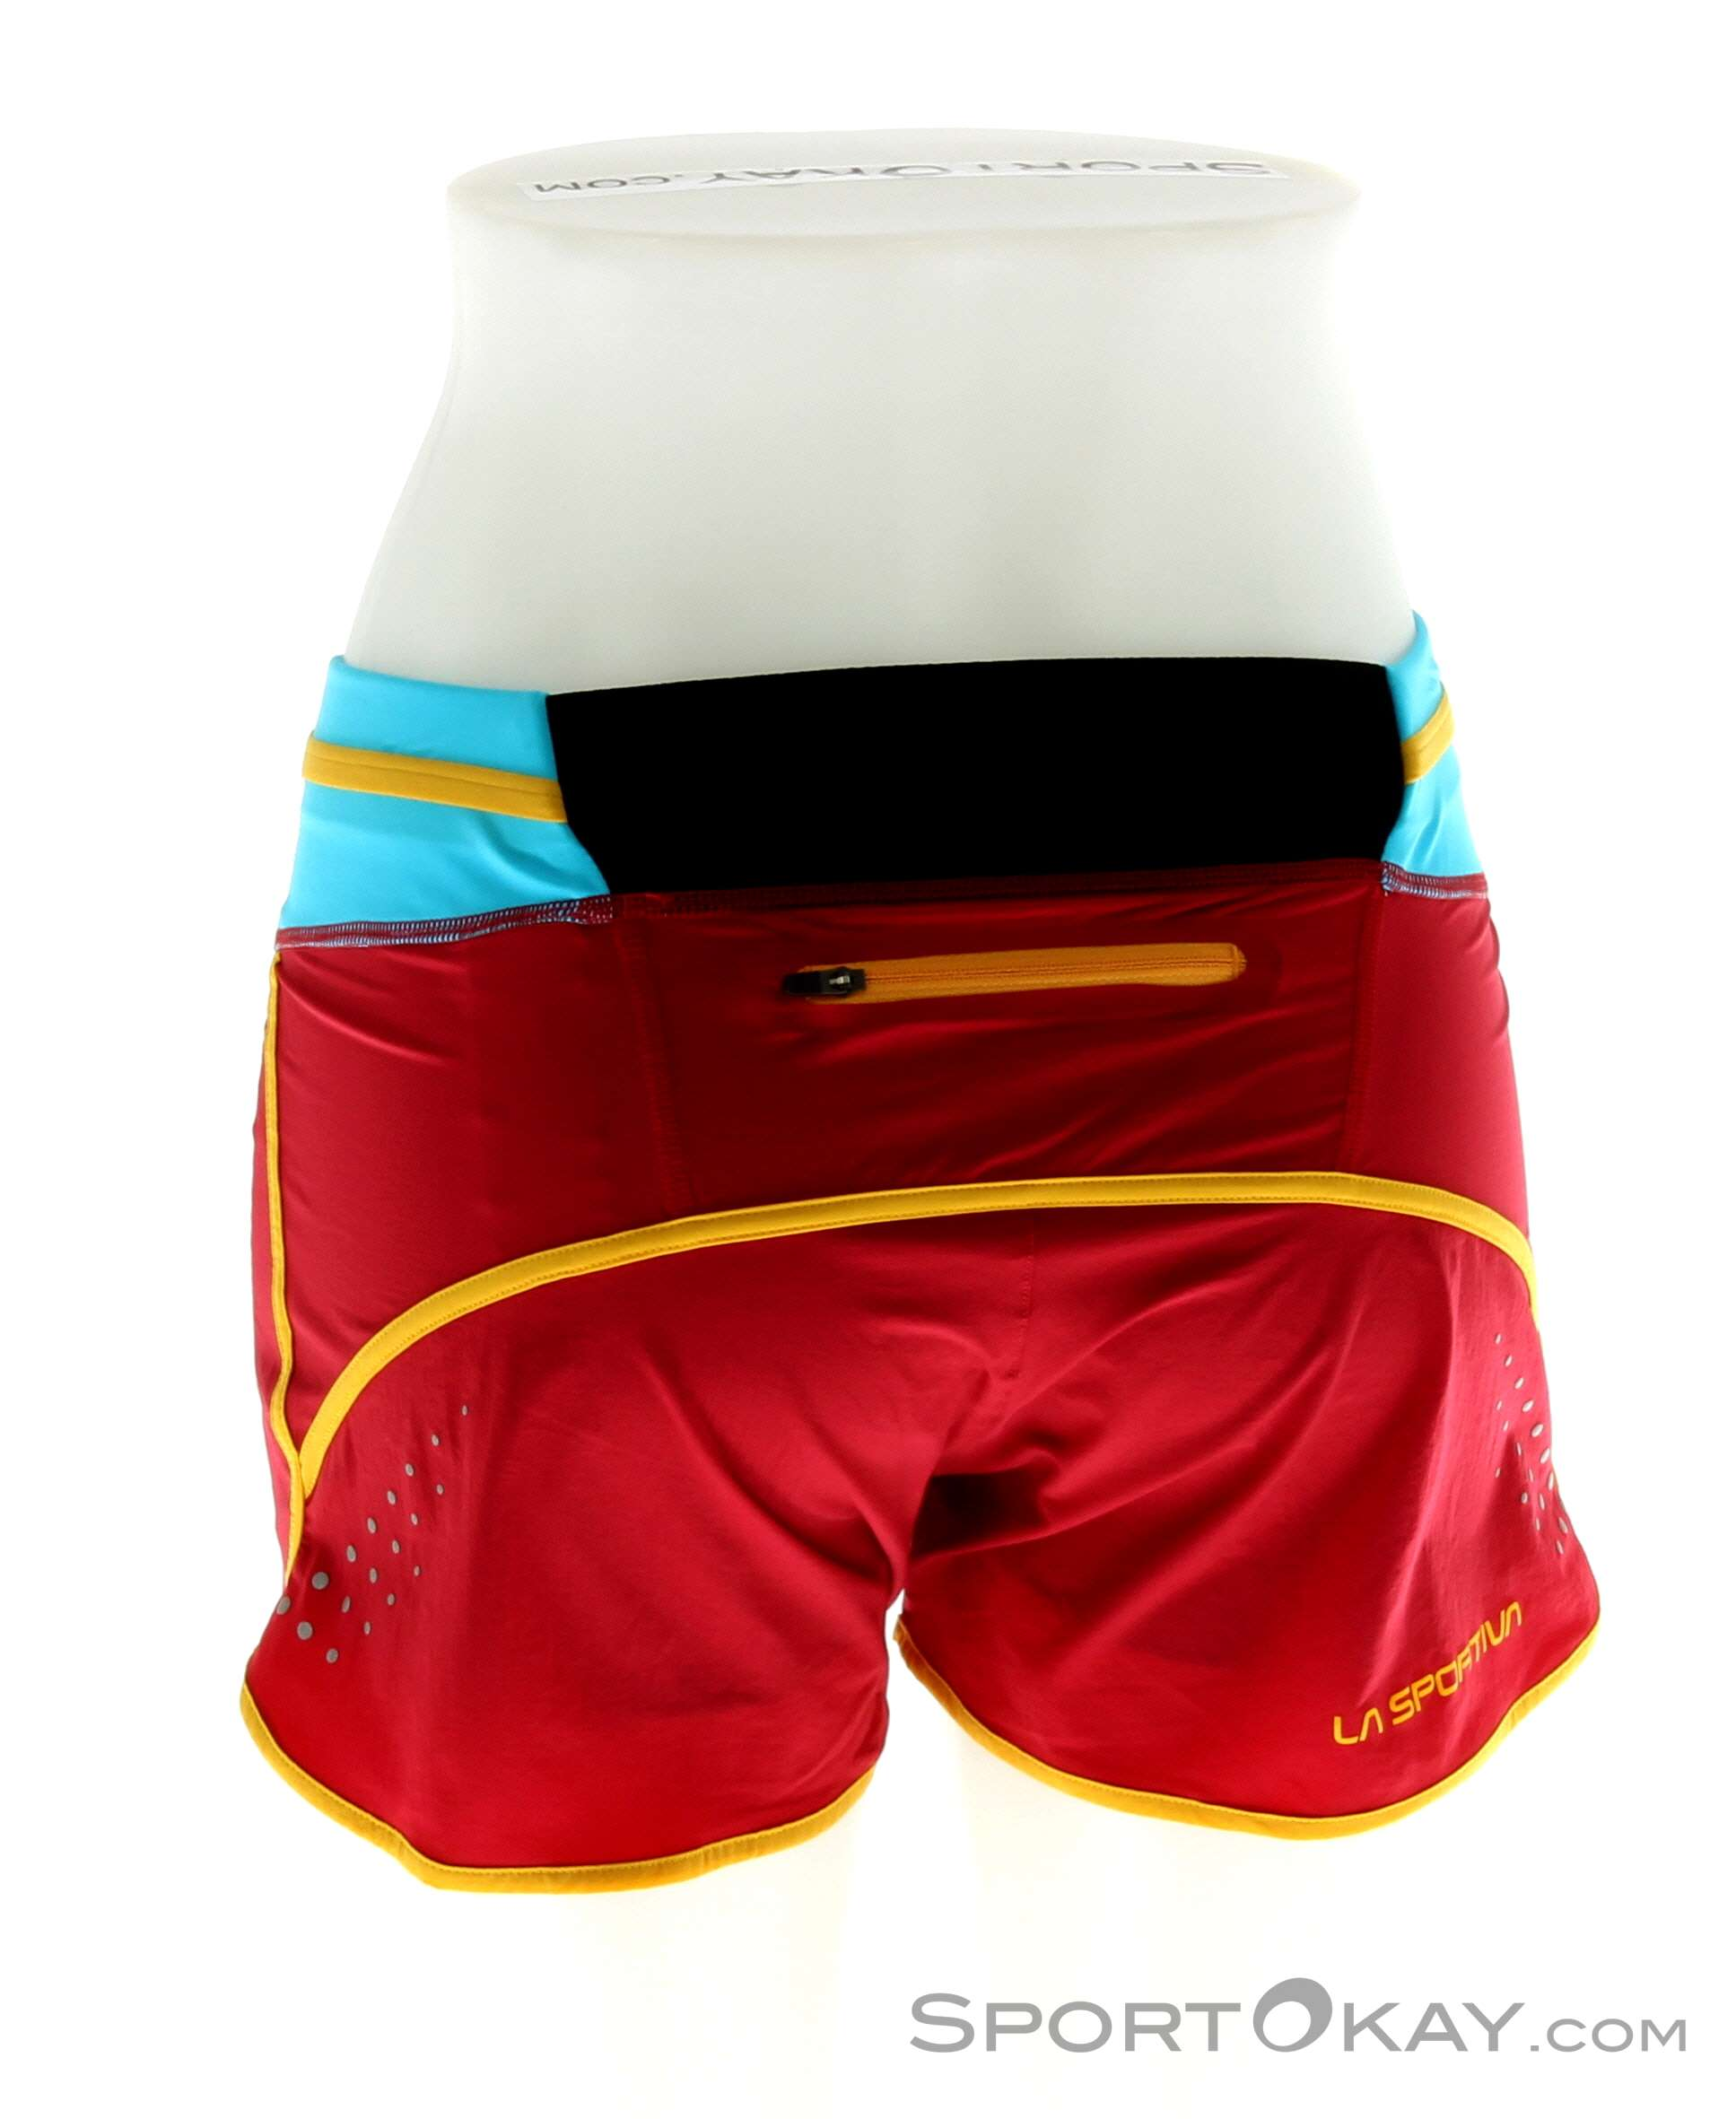 la sportiva snap short womens running pants pants. Black Bedroom Furniture Sets. Home Design Ideas